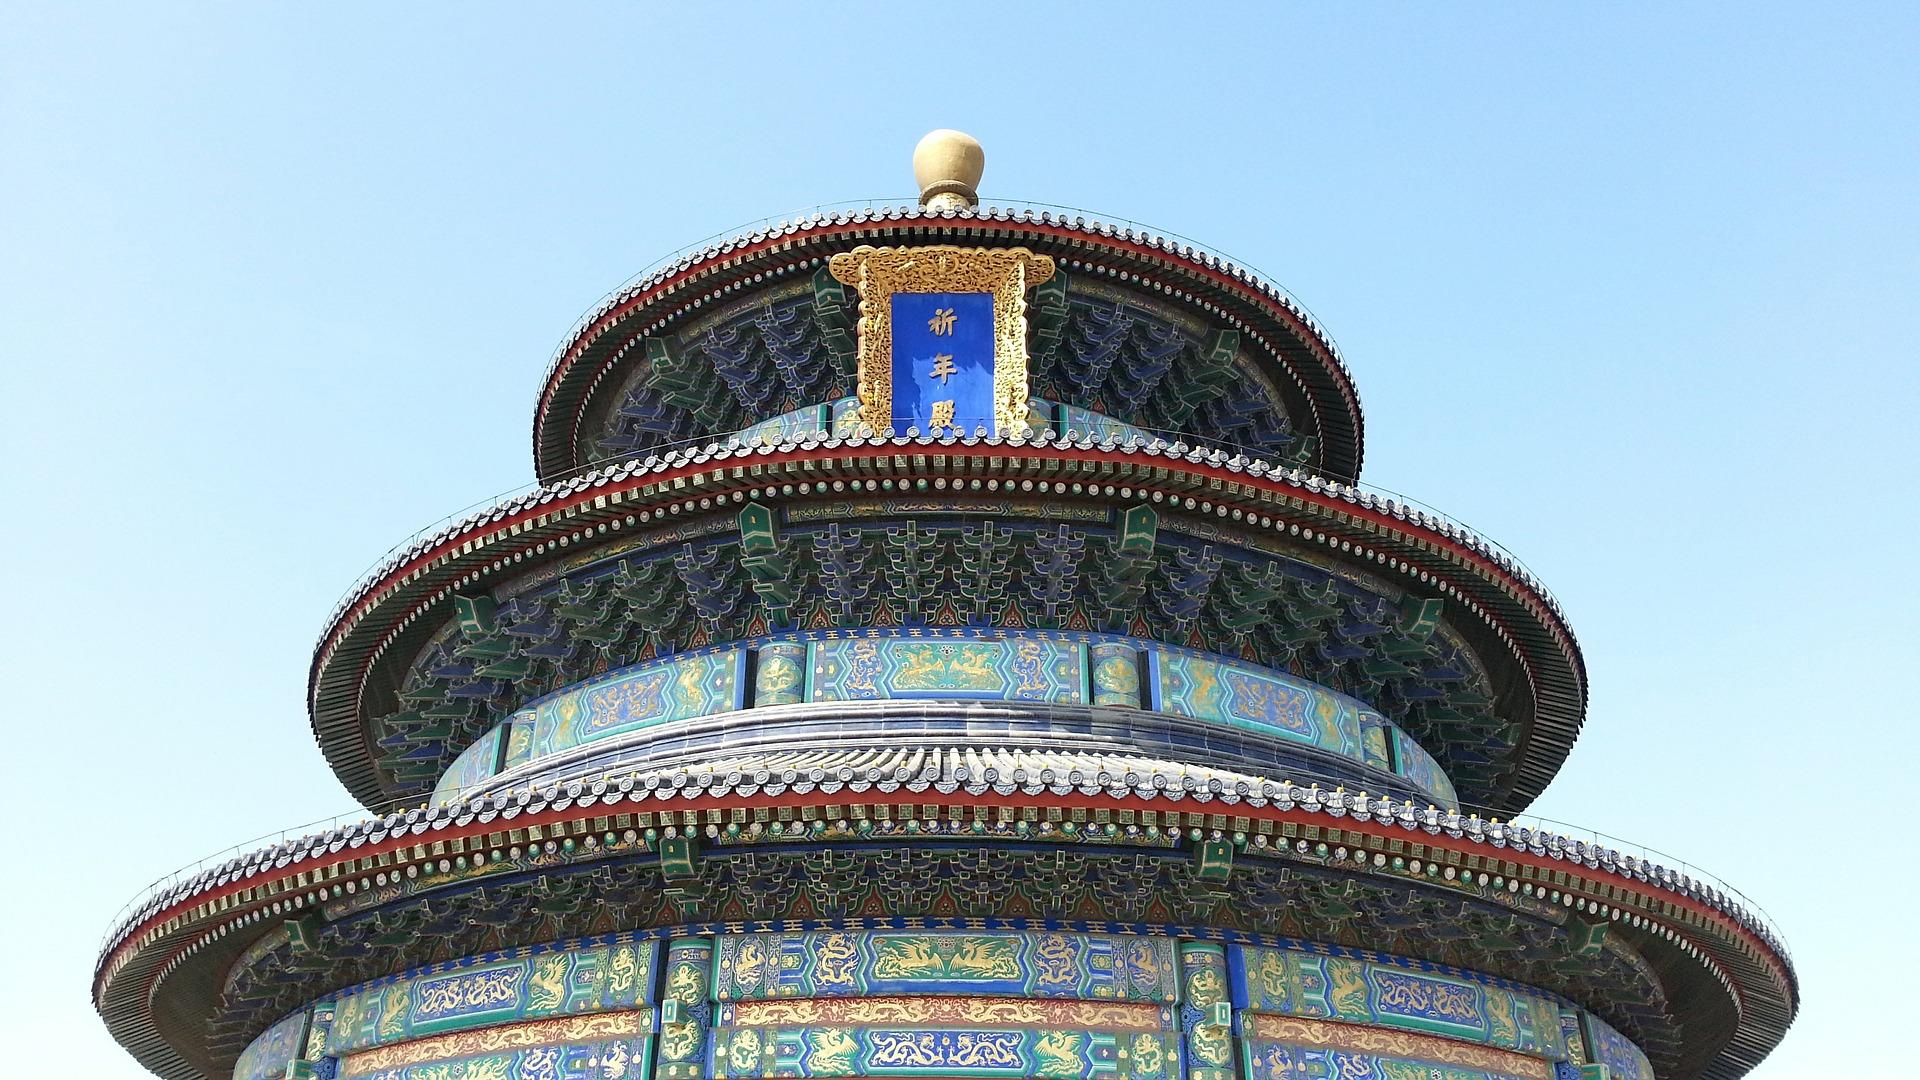 temple-of-heaven-444437_1920.jpg